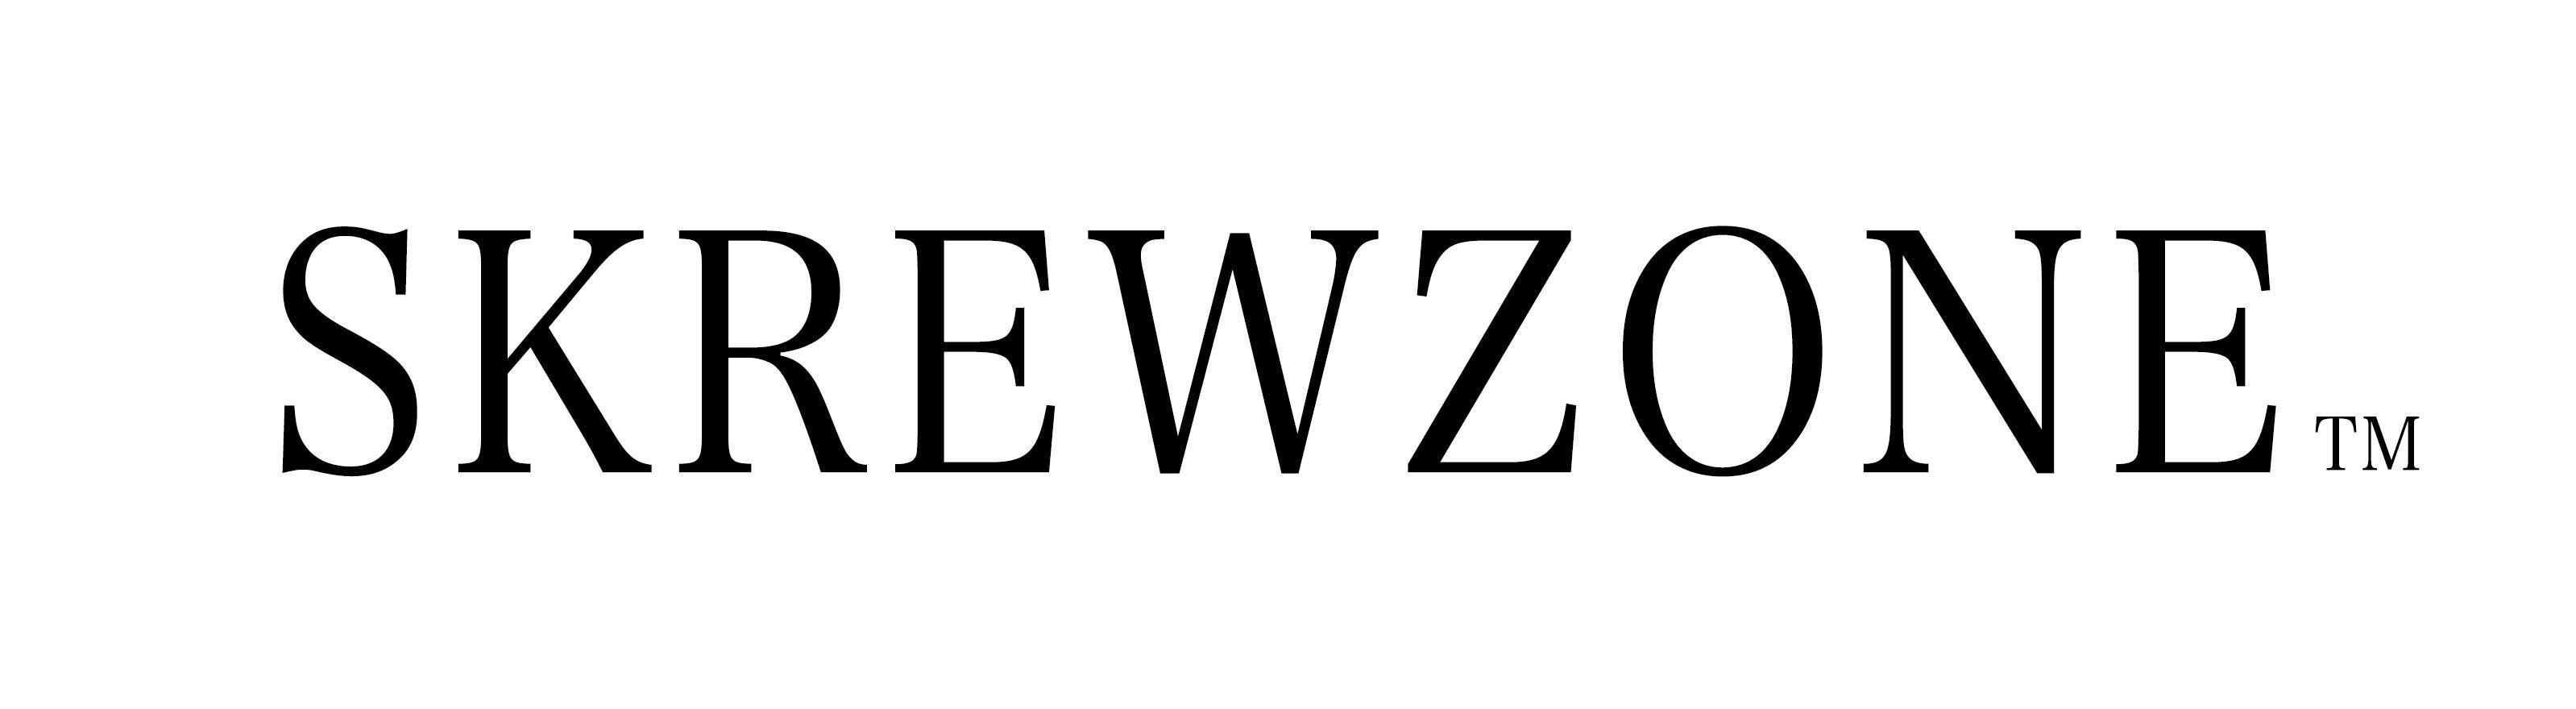 SKREWZONE (スクリューゾーン)